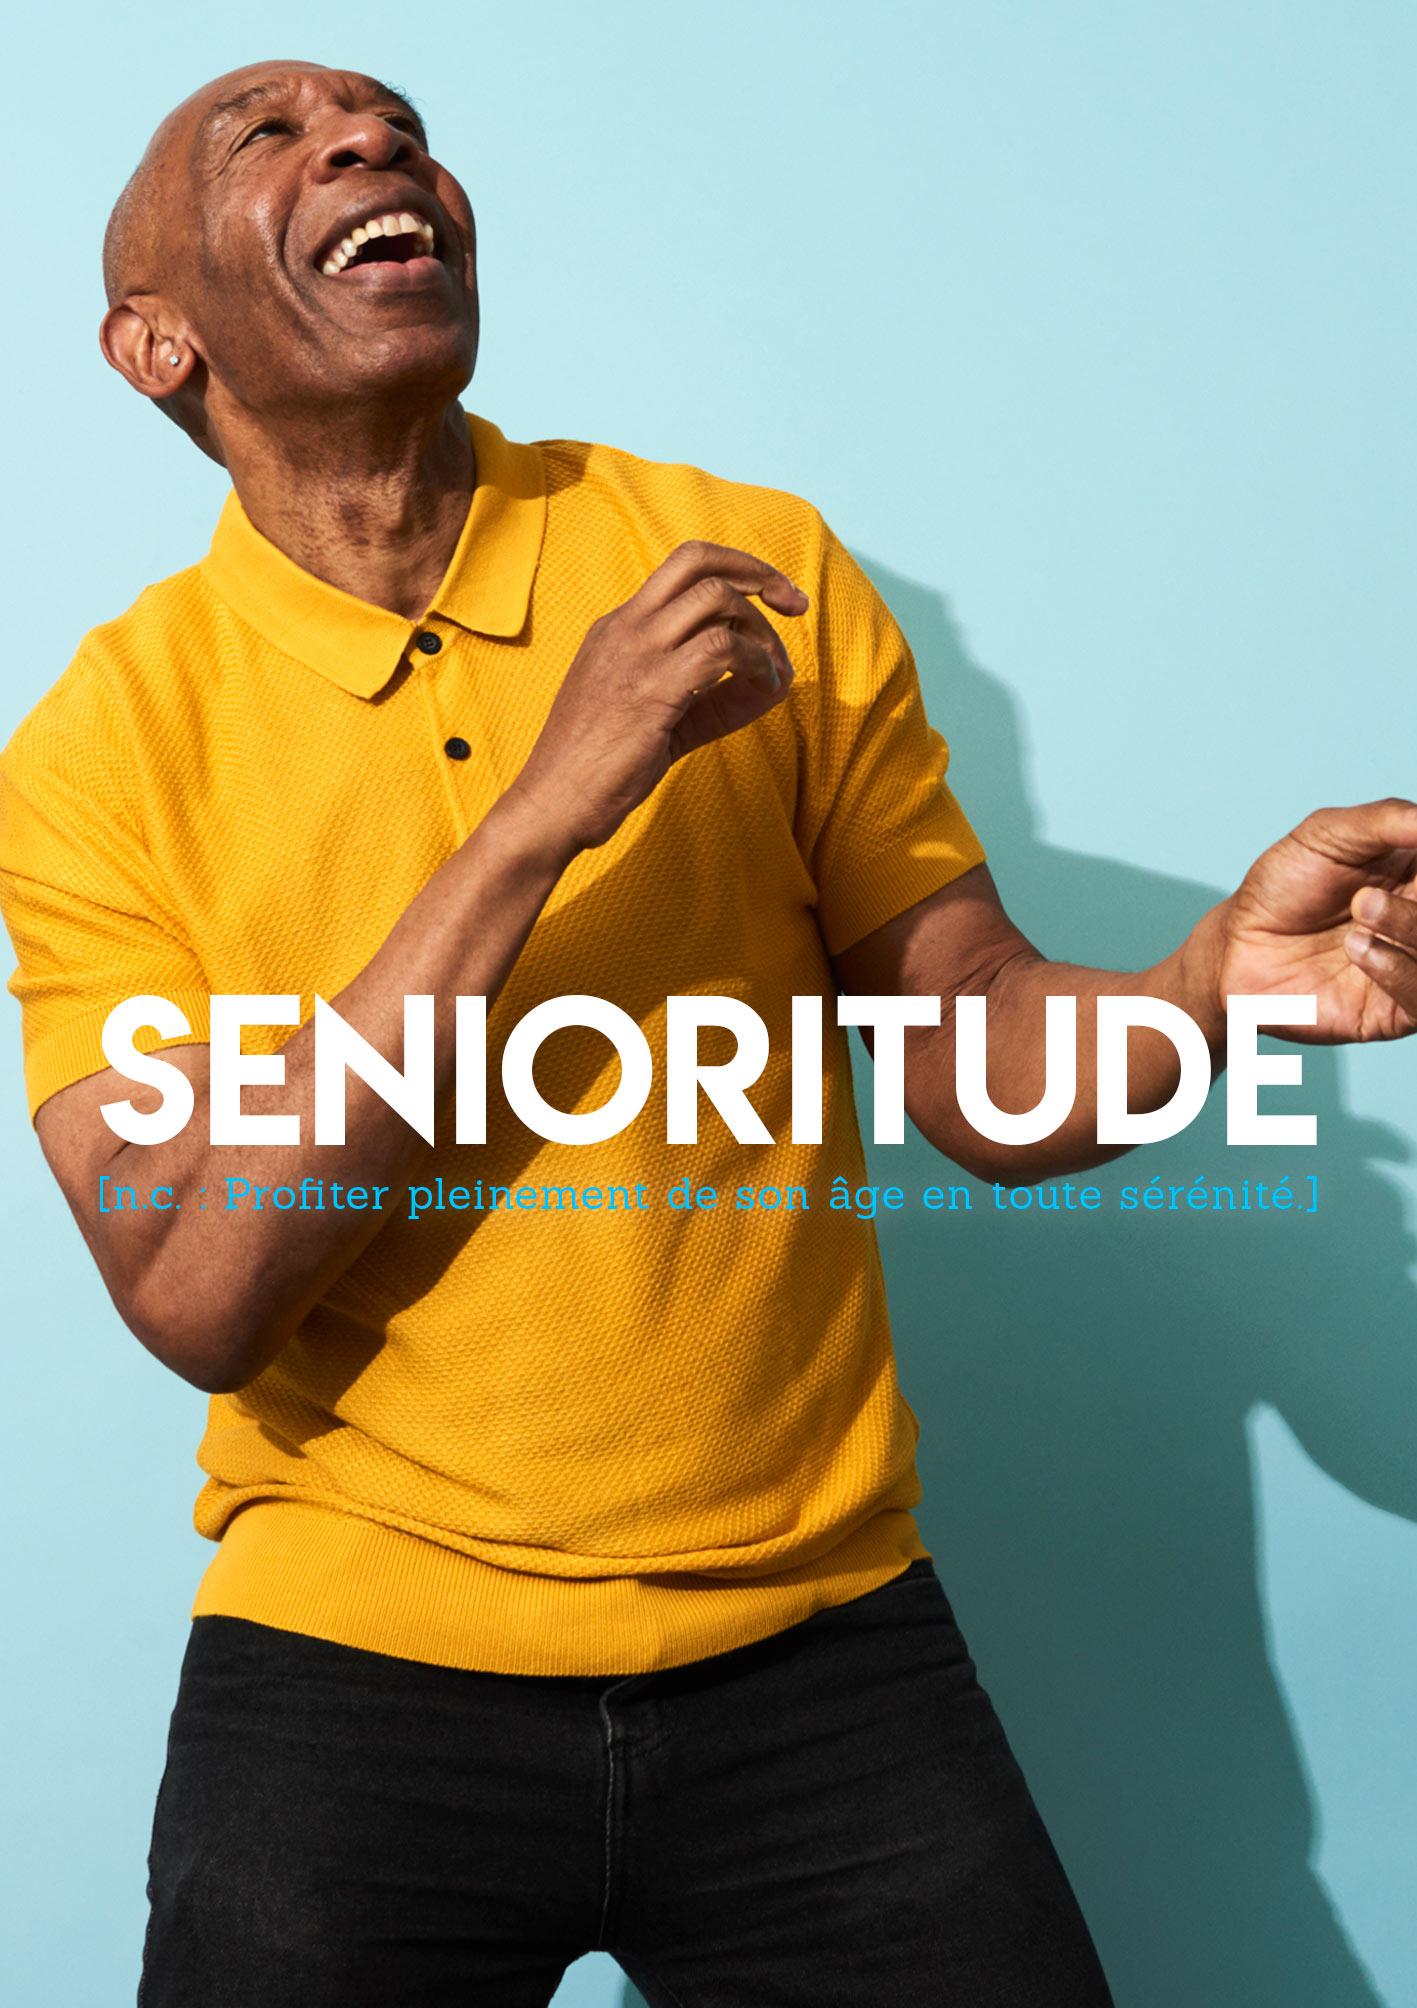 Senioritude 2.jpg